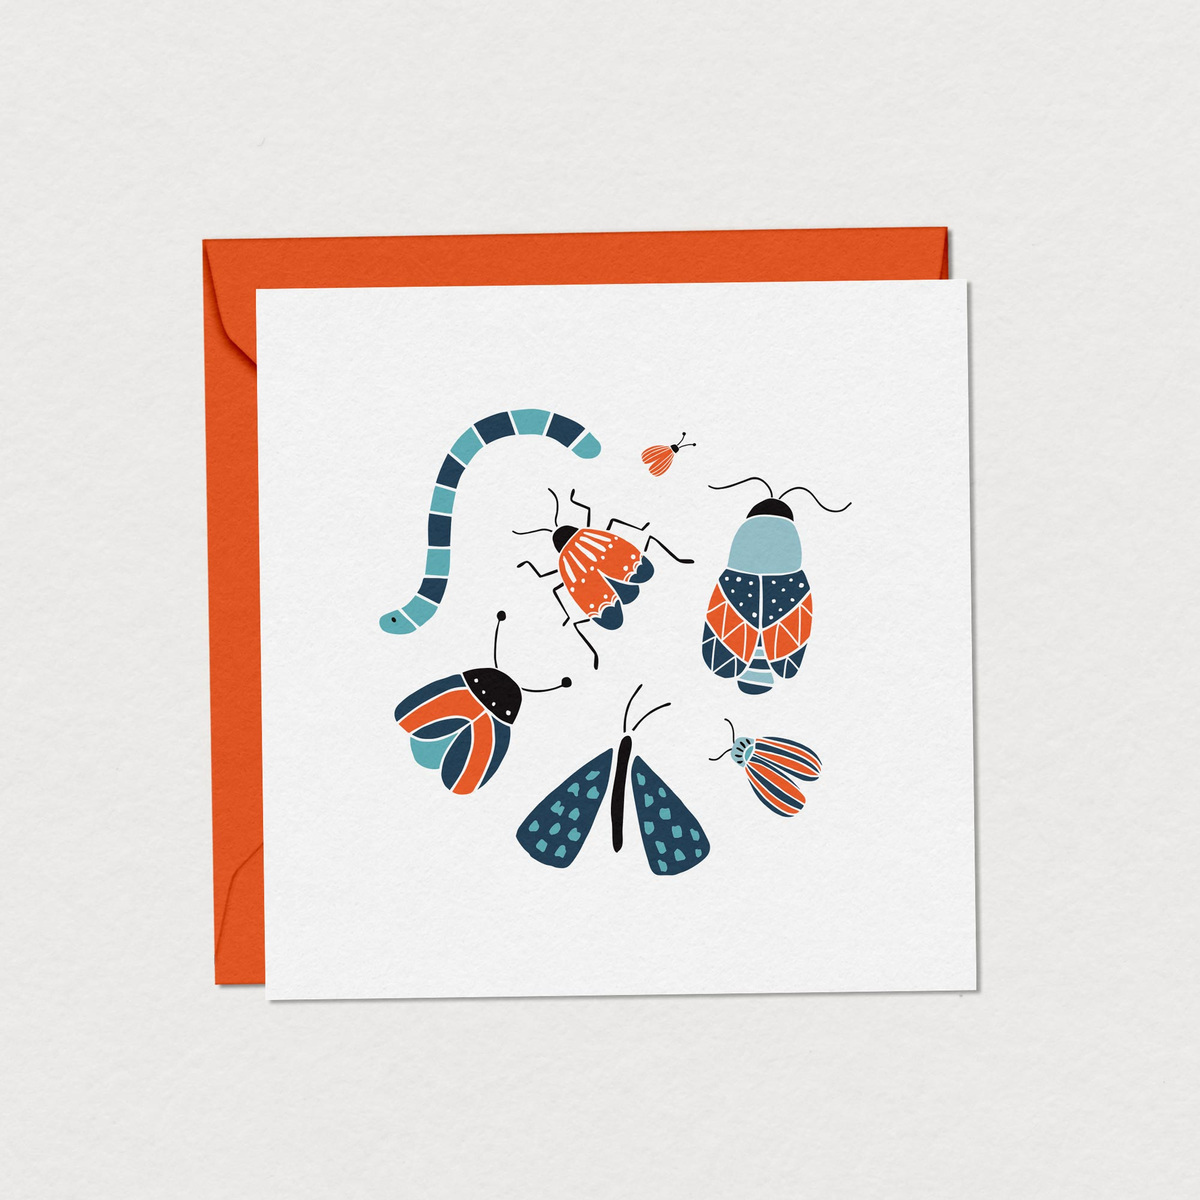 mfa -- designer textile - bibittes